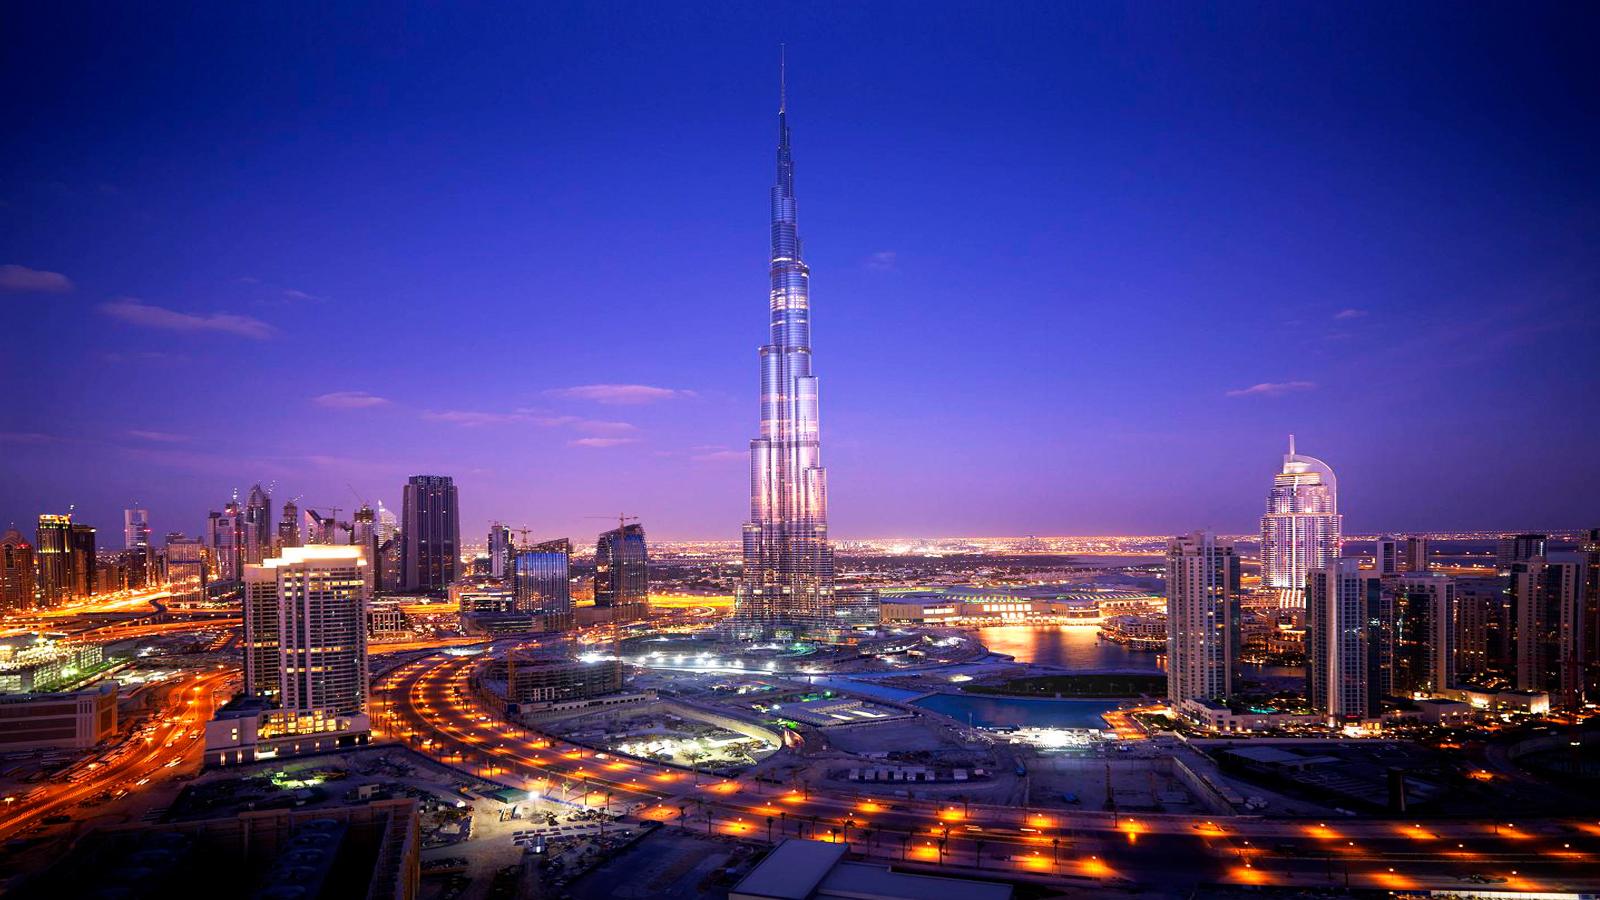 Download Wallpapers   Dubai City Guide 1600x900